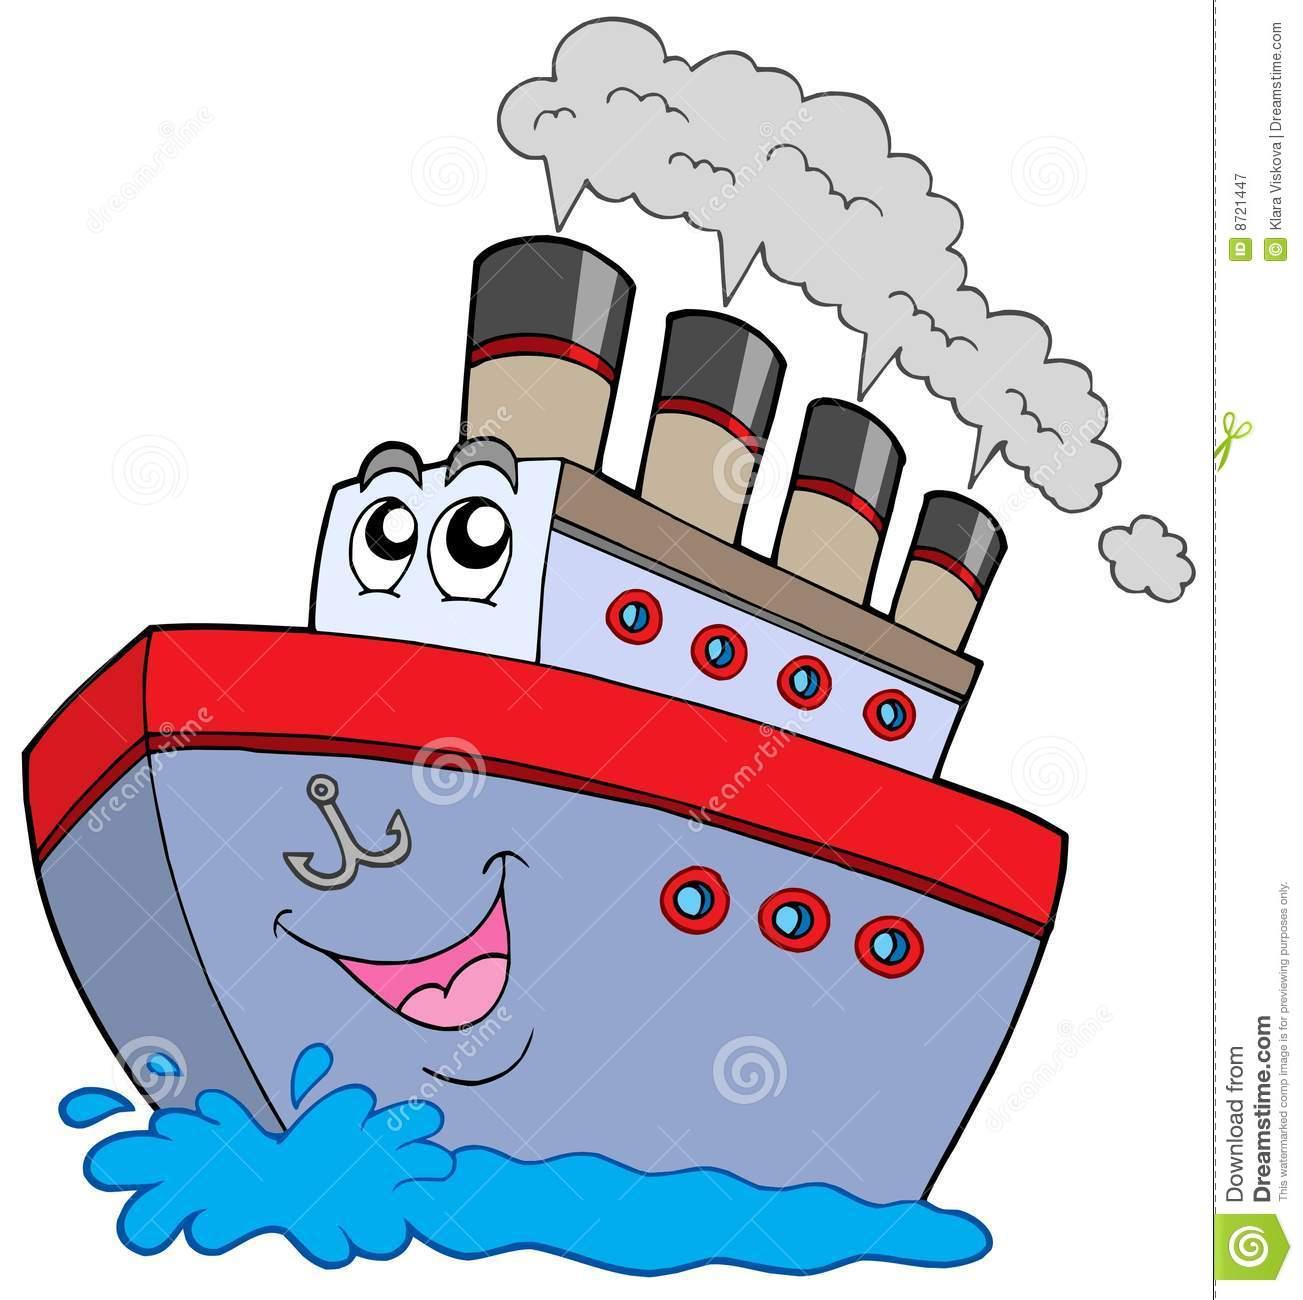 Cartoon boat stock vector. Illustration of recreation.